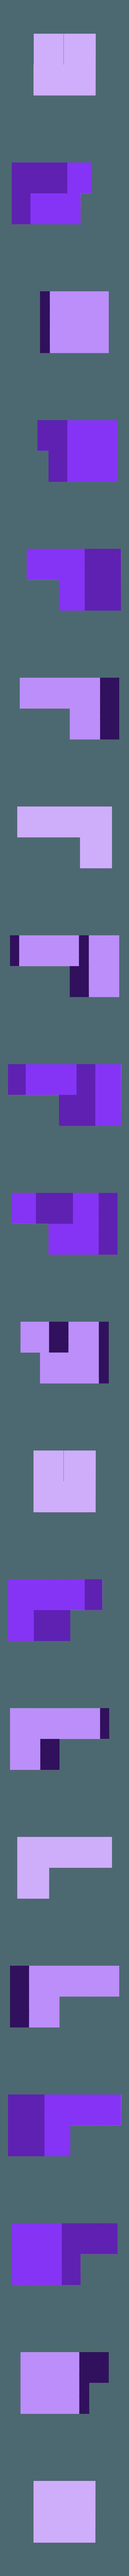 Twins_B_x_2.stl Download free STL file Puzzle - Triple twins • 3D print model, dancingchicken